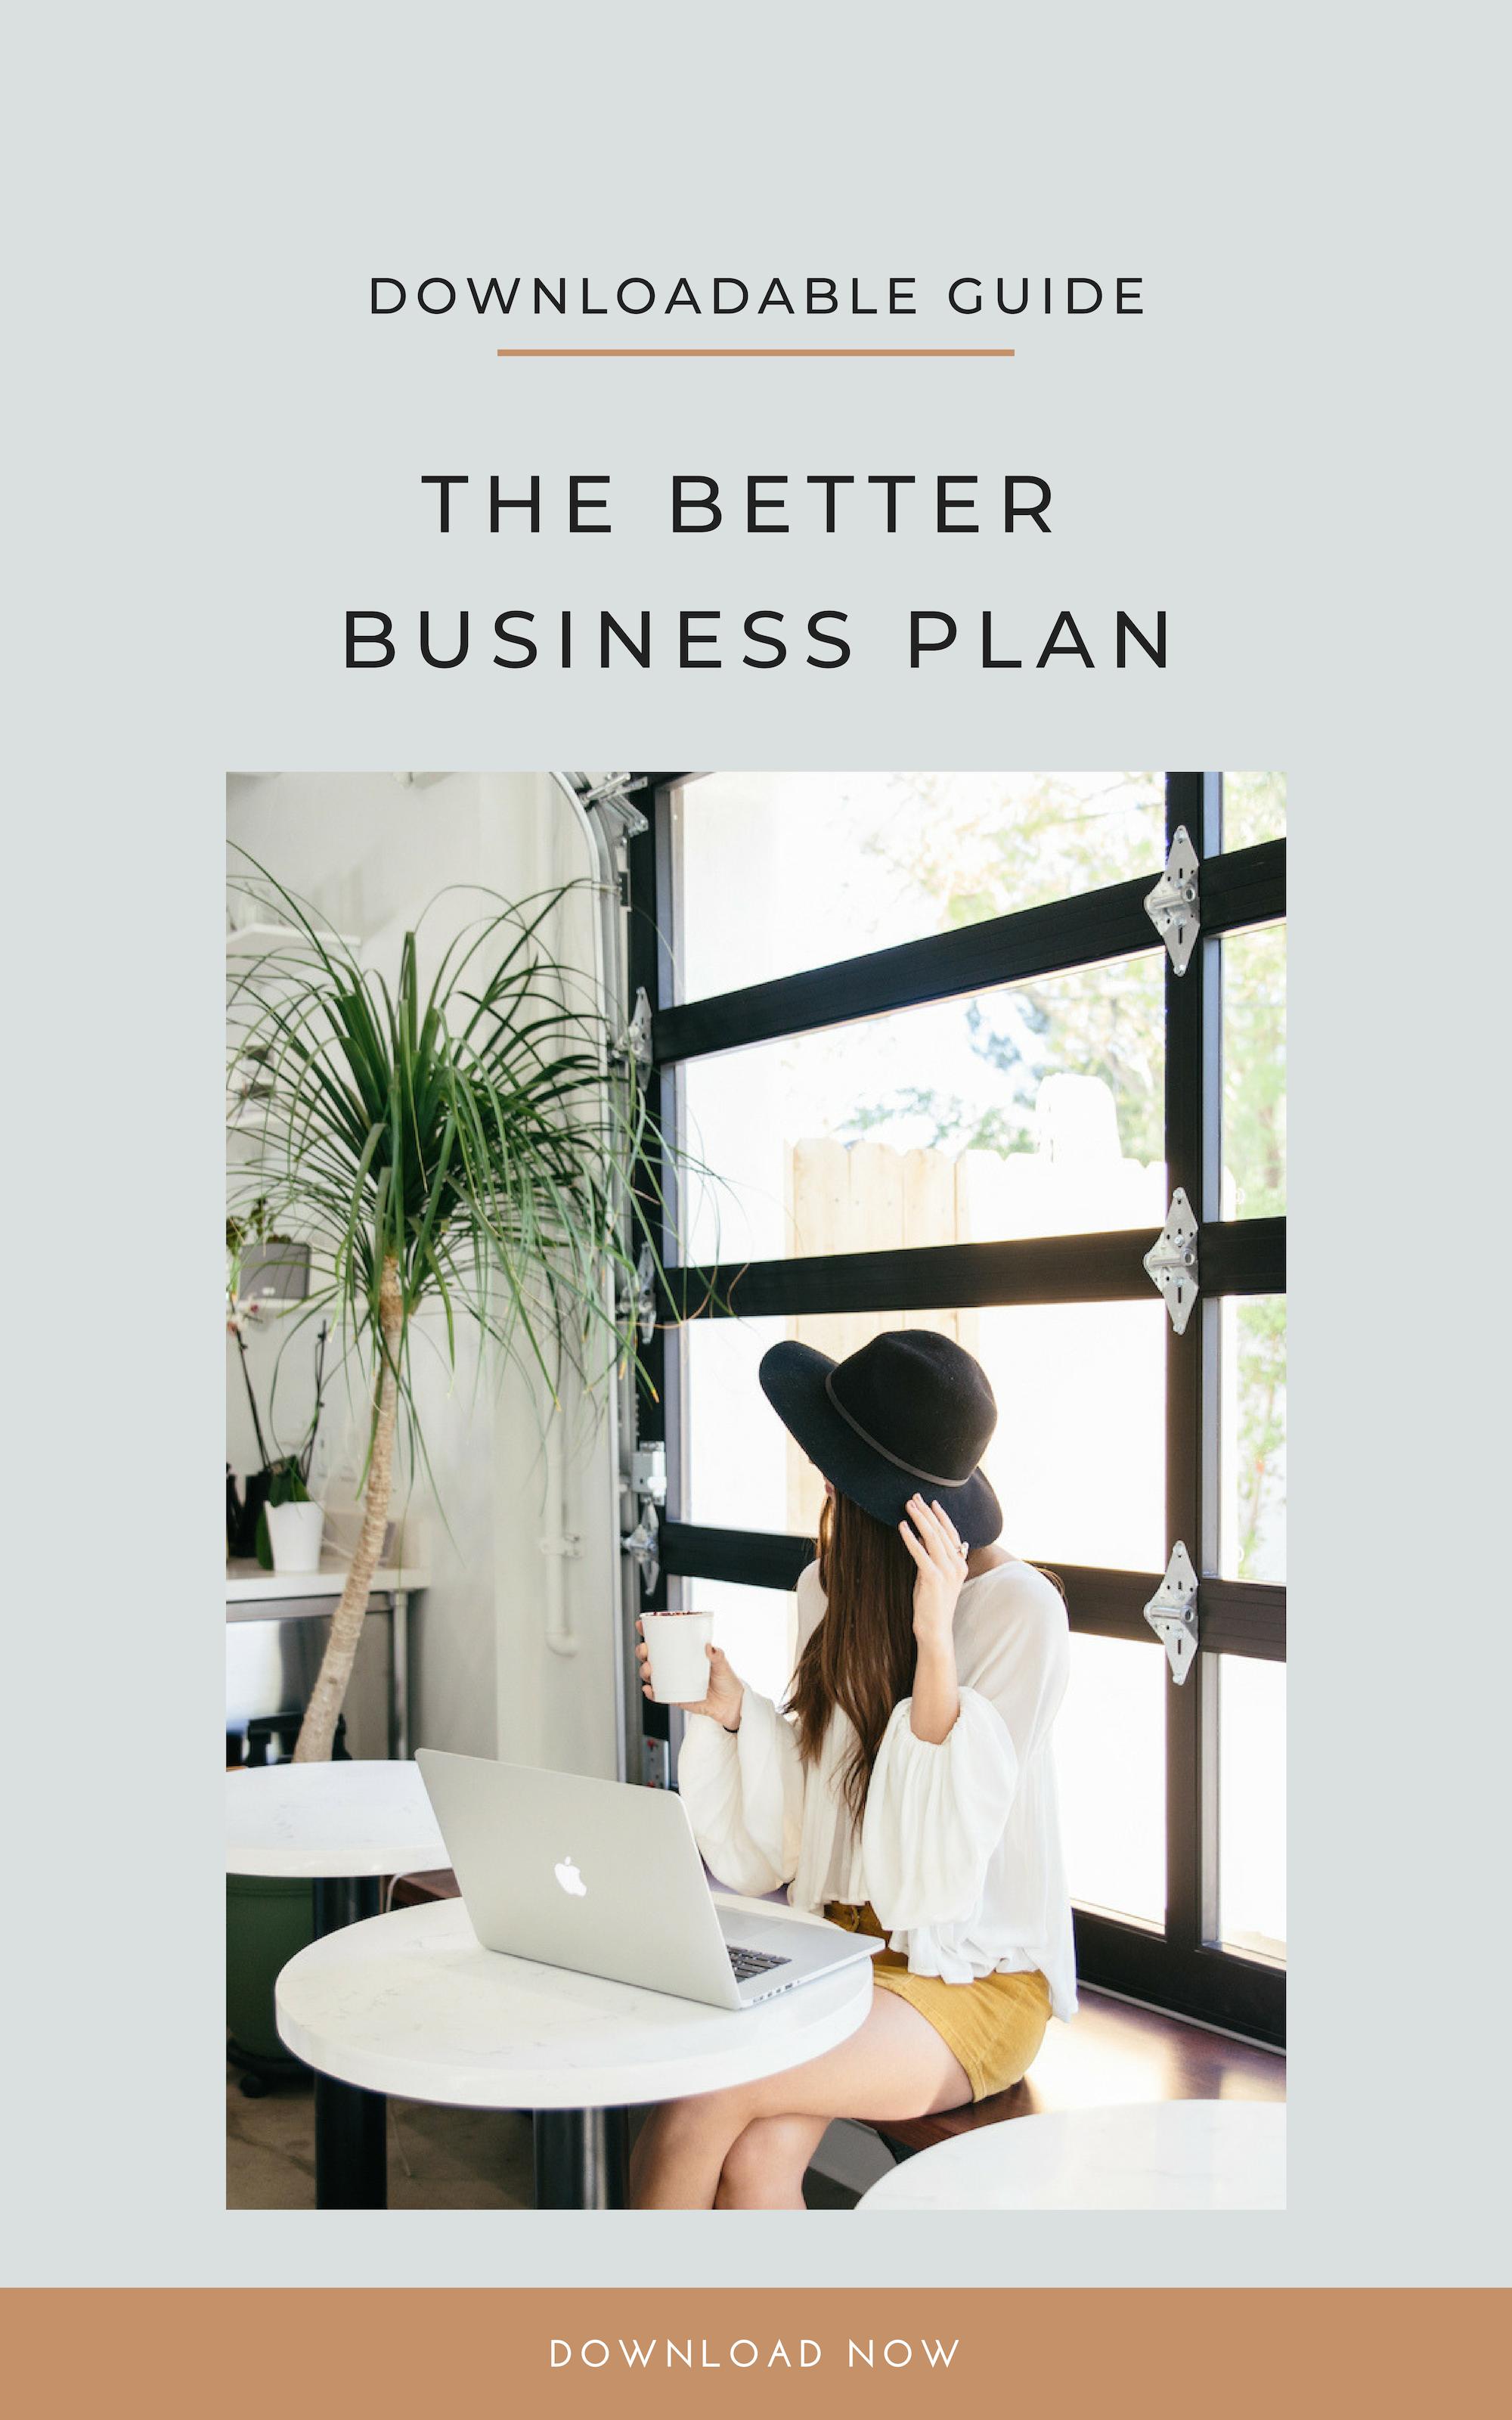 The Better Business Plan